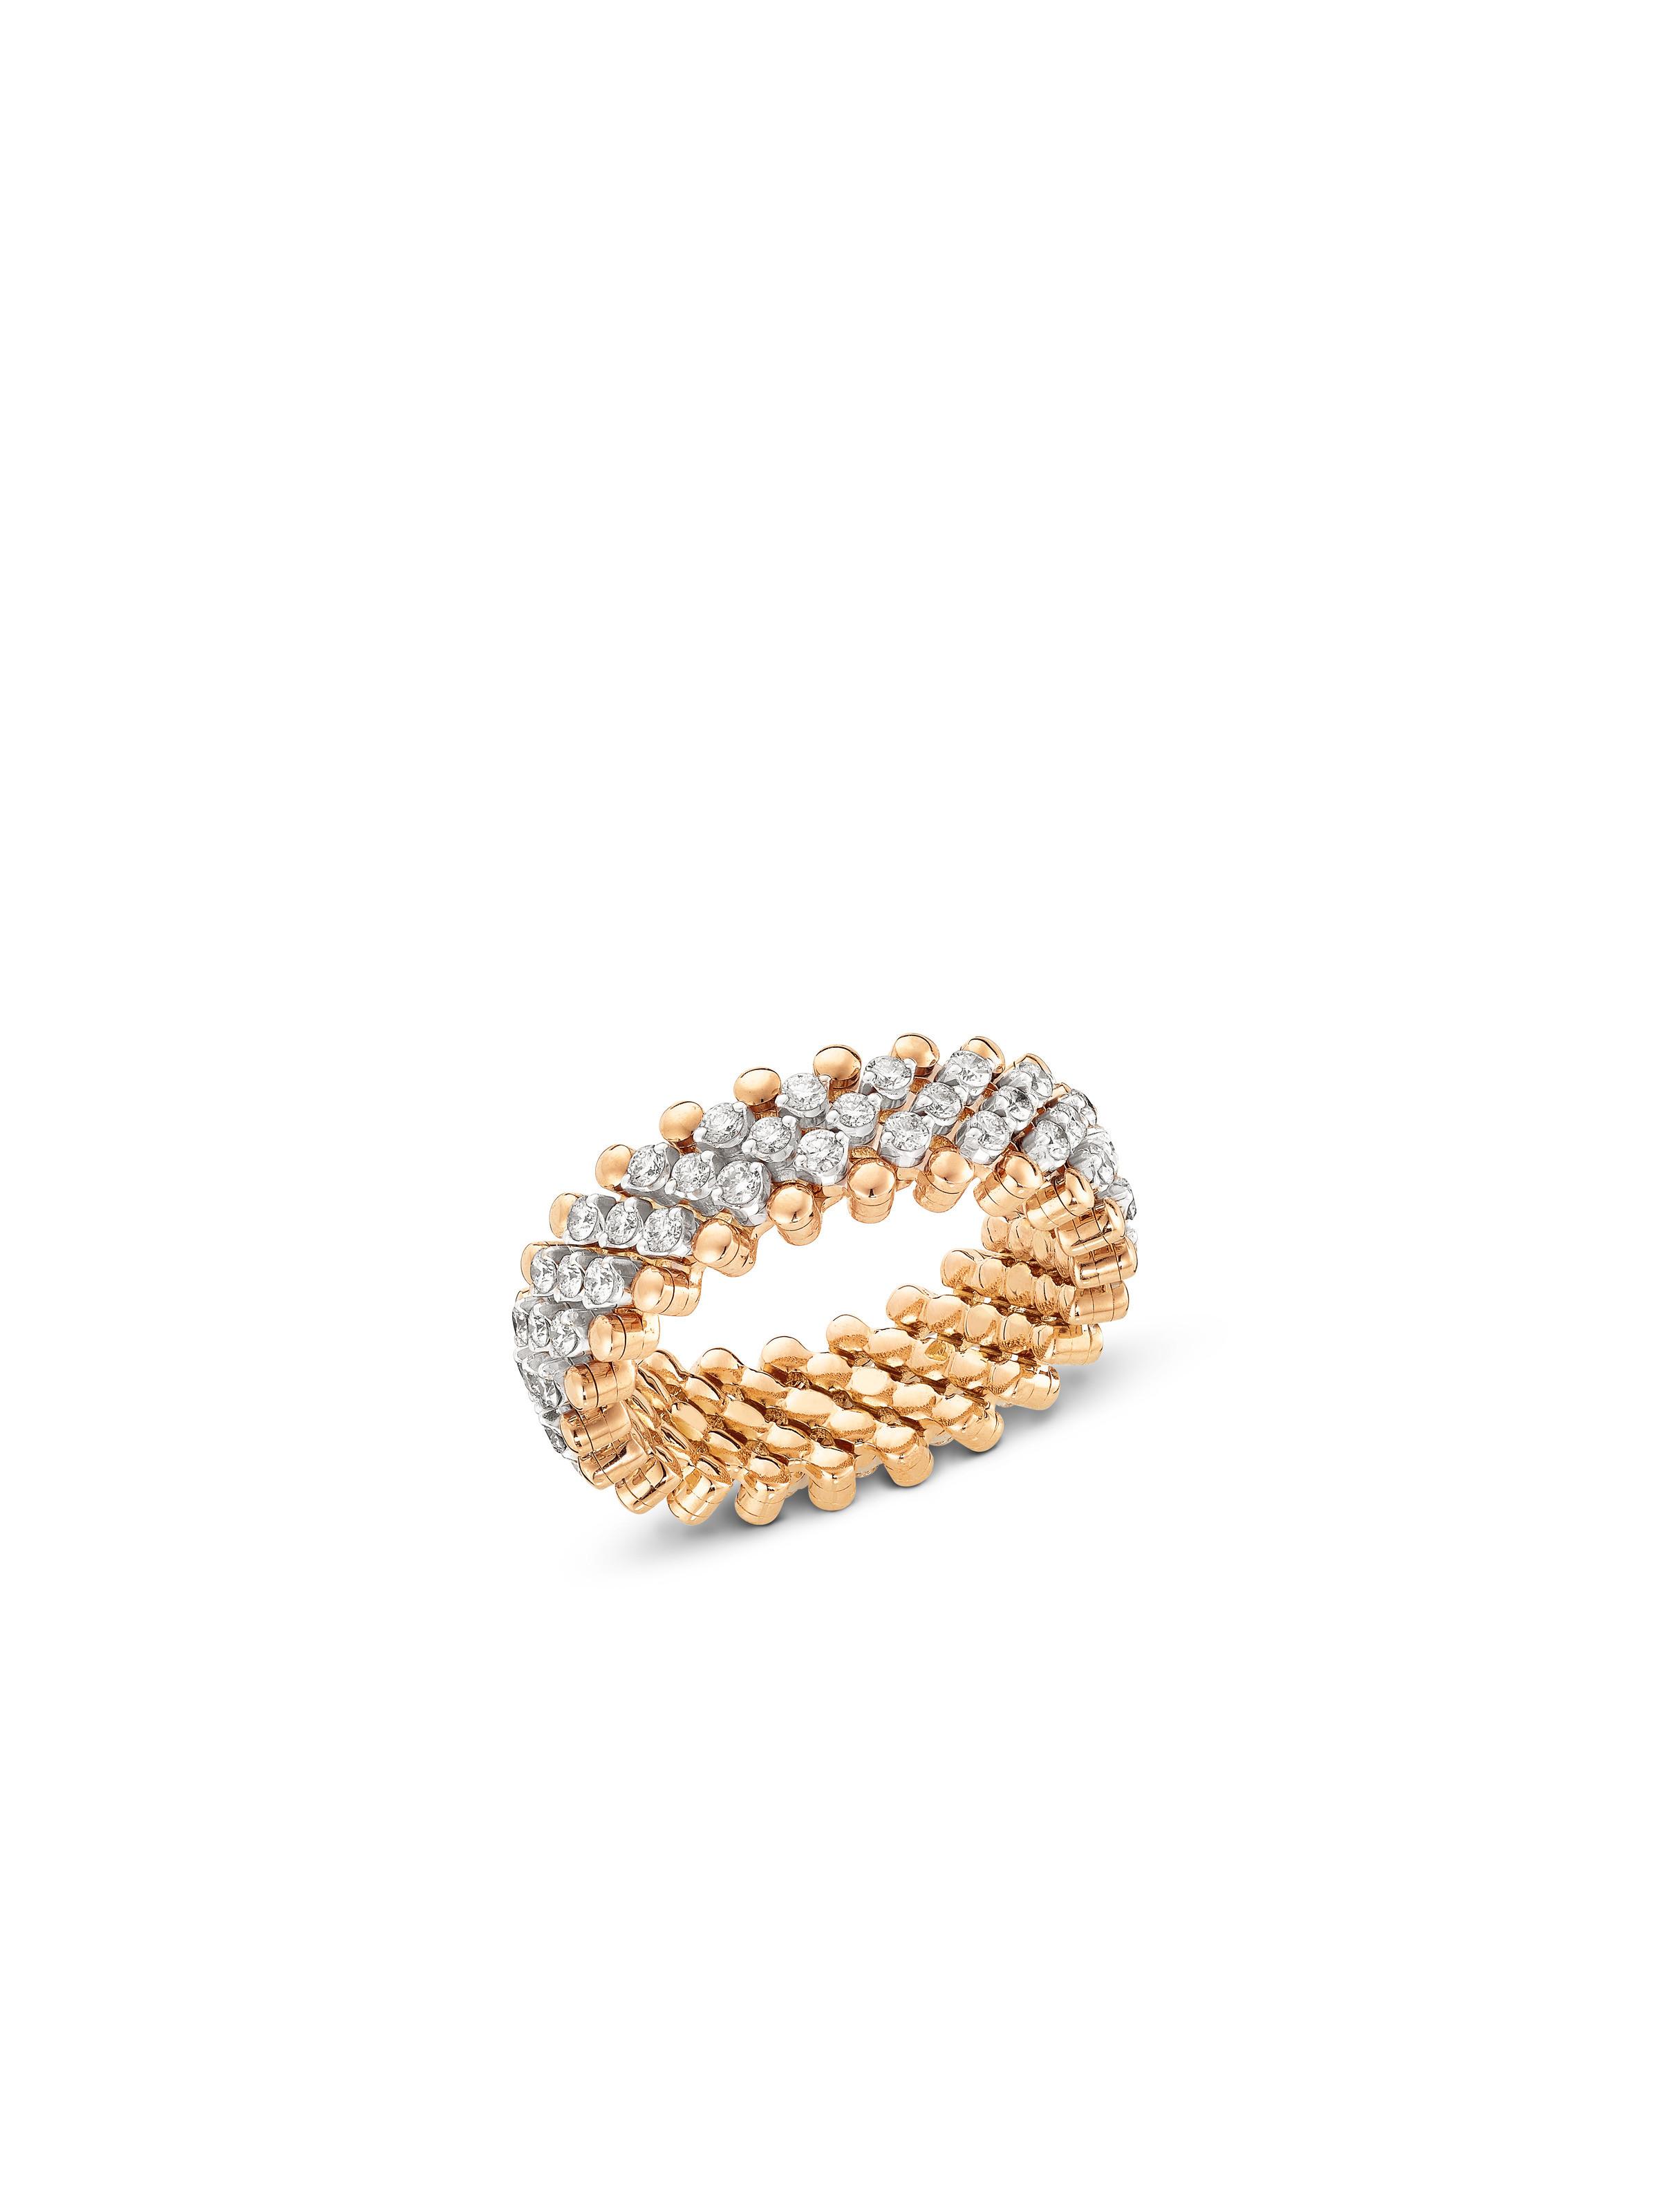 Multisize Serafino Consoli ring